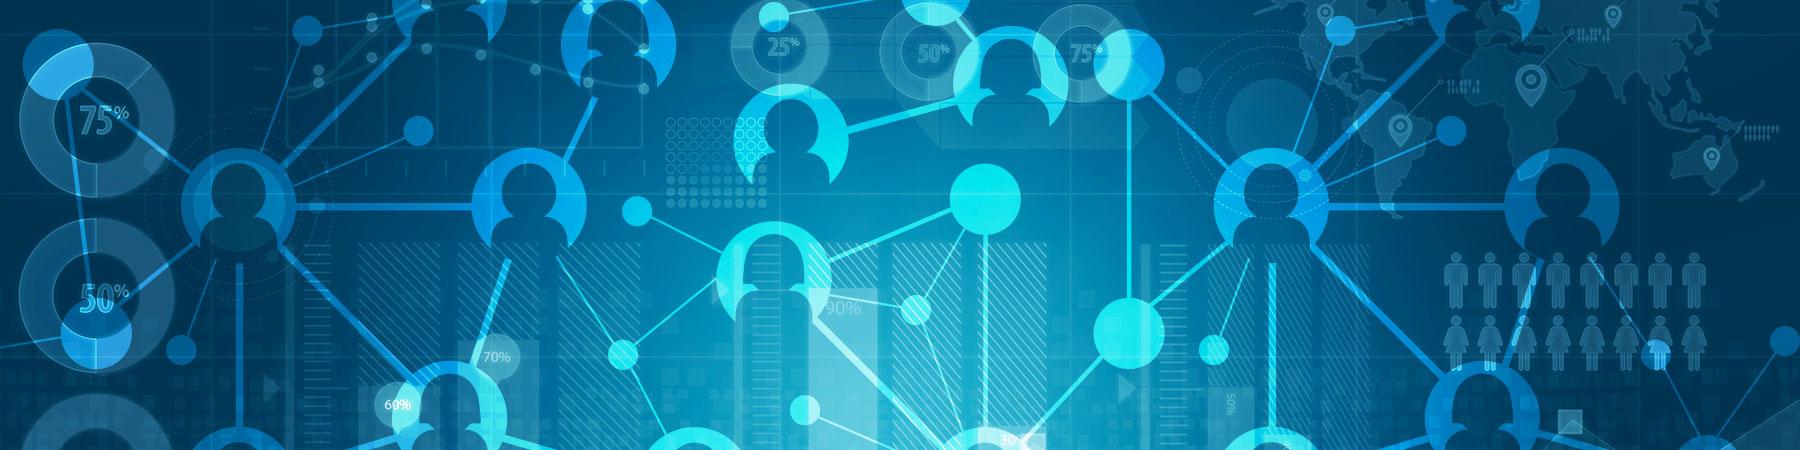 Real-user Monitoring (RUM)